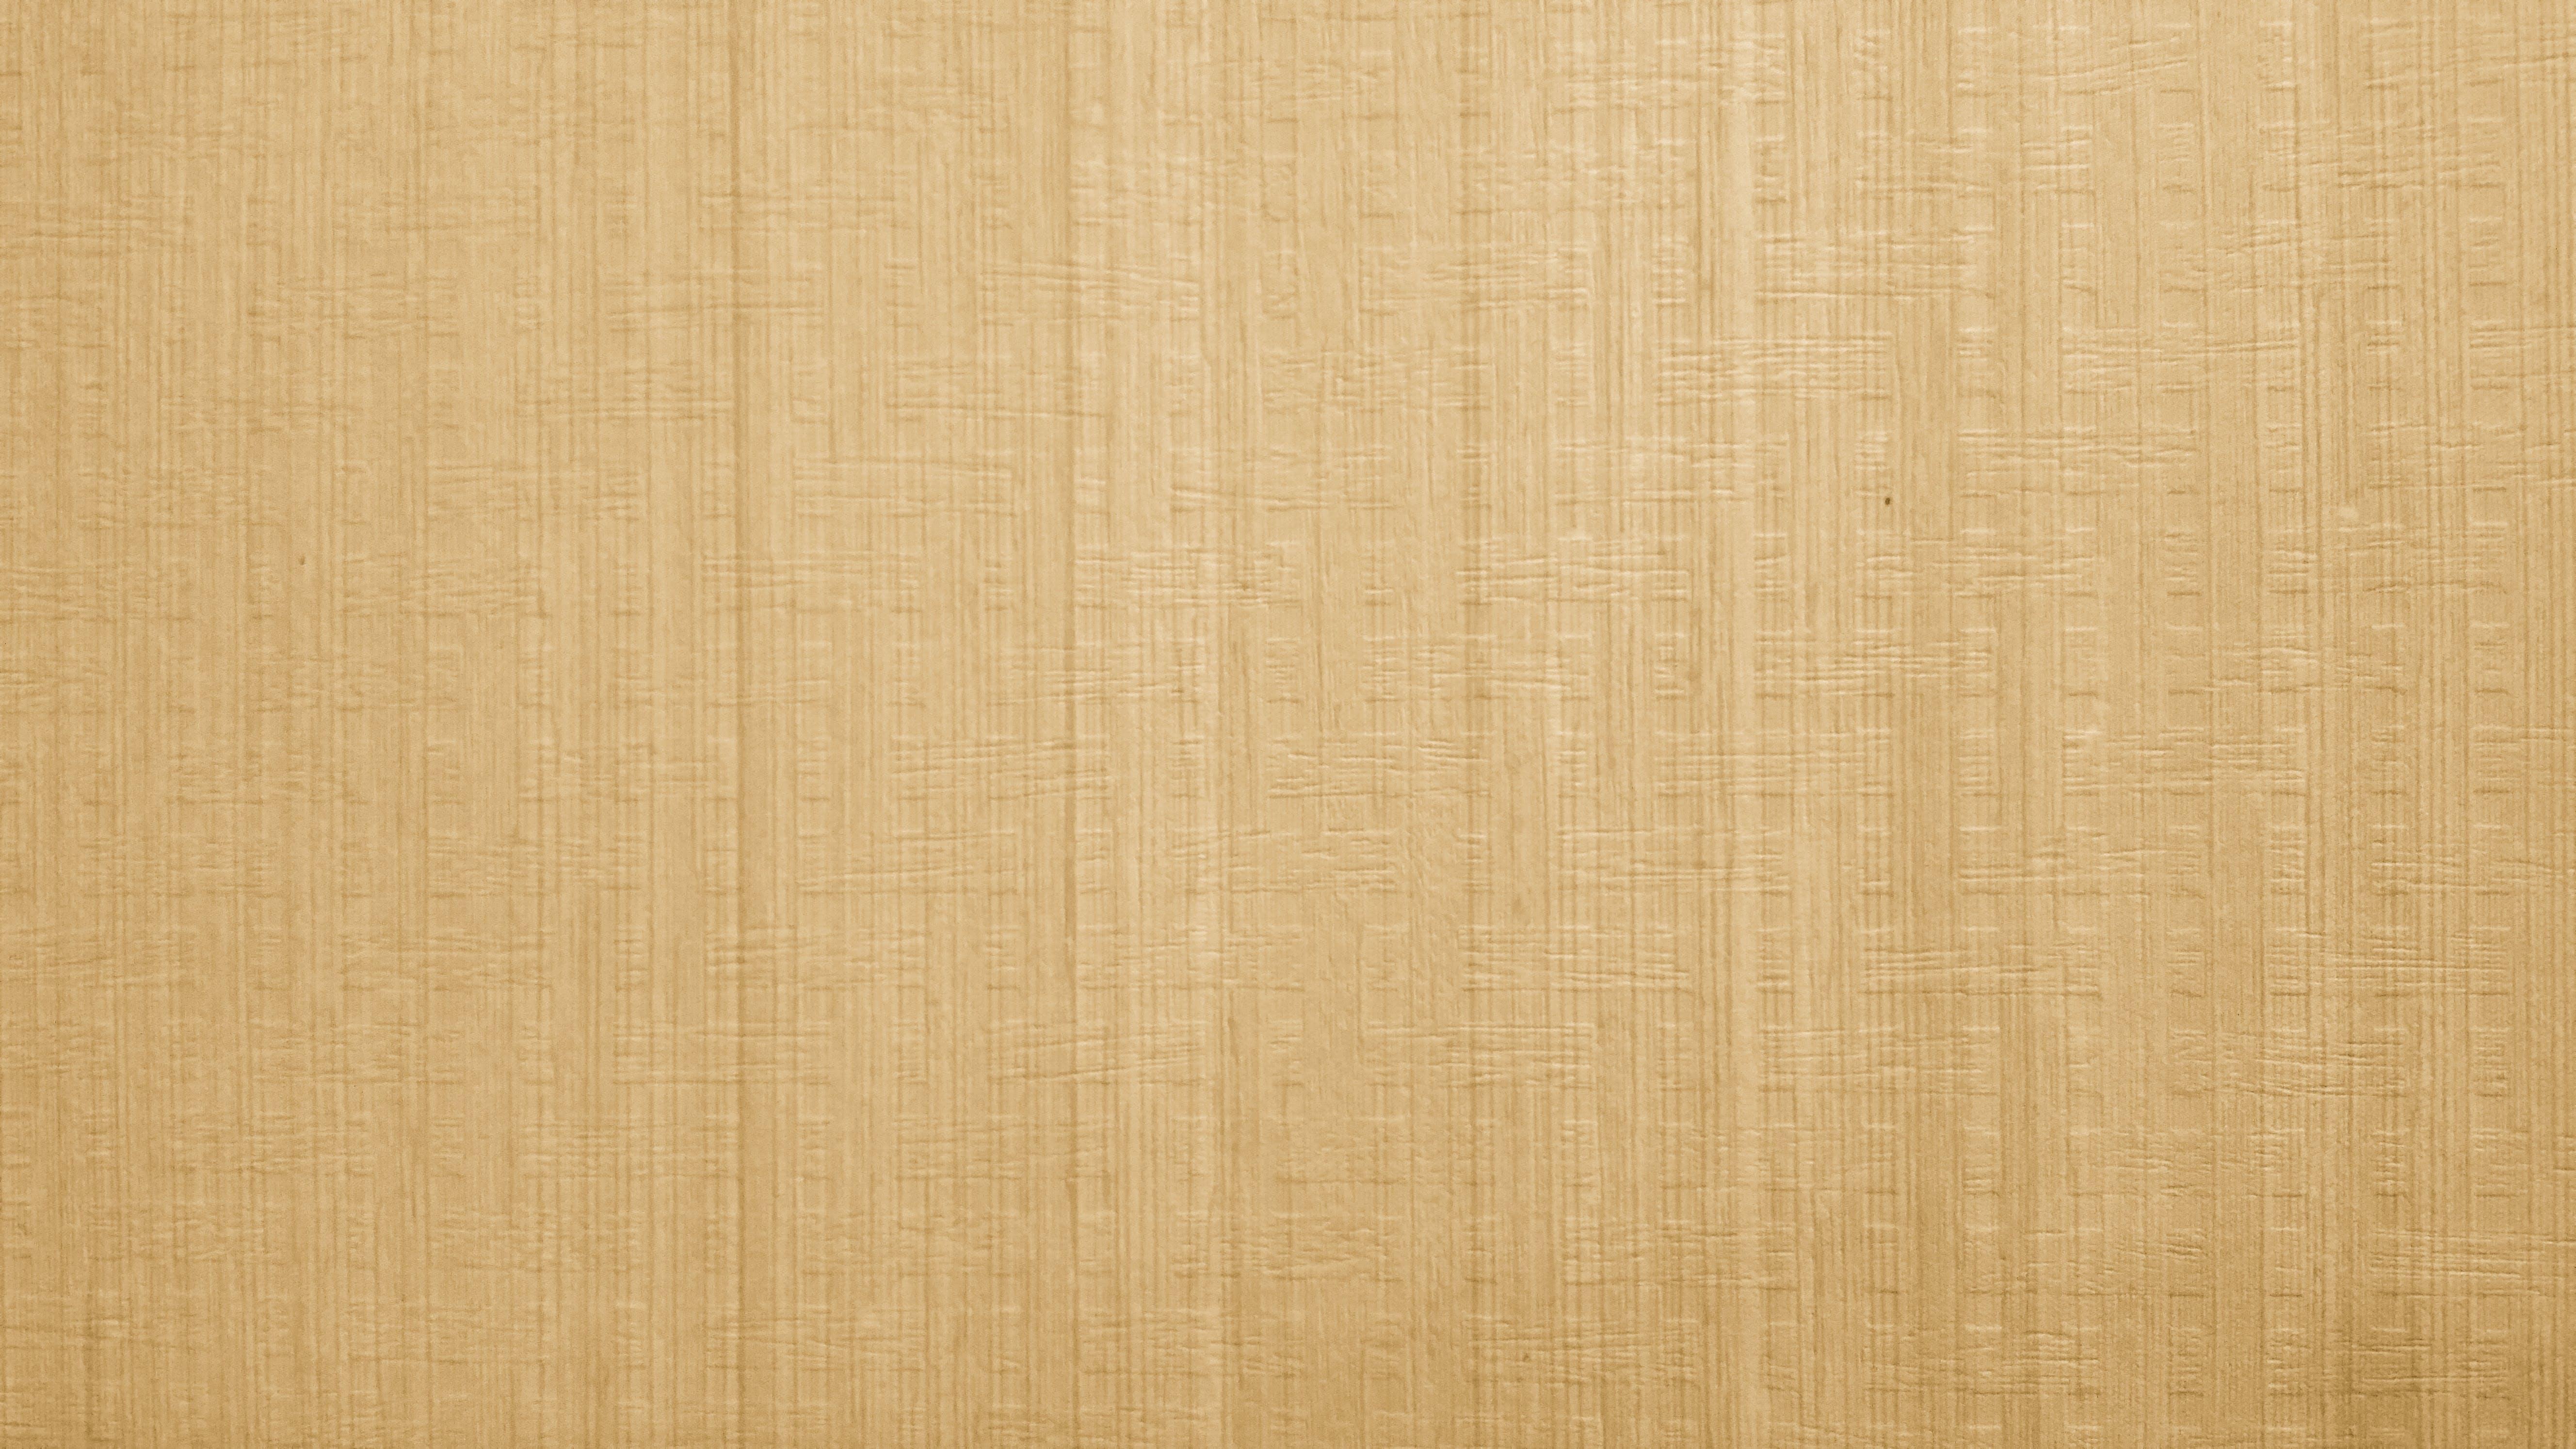 Free stock photo of wood, wooden, desktop, background